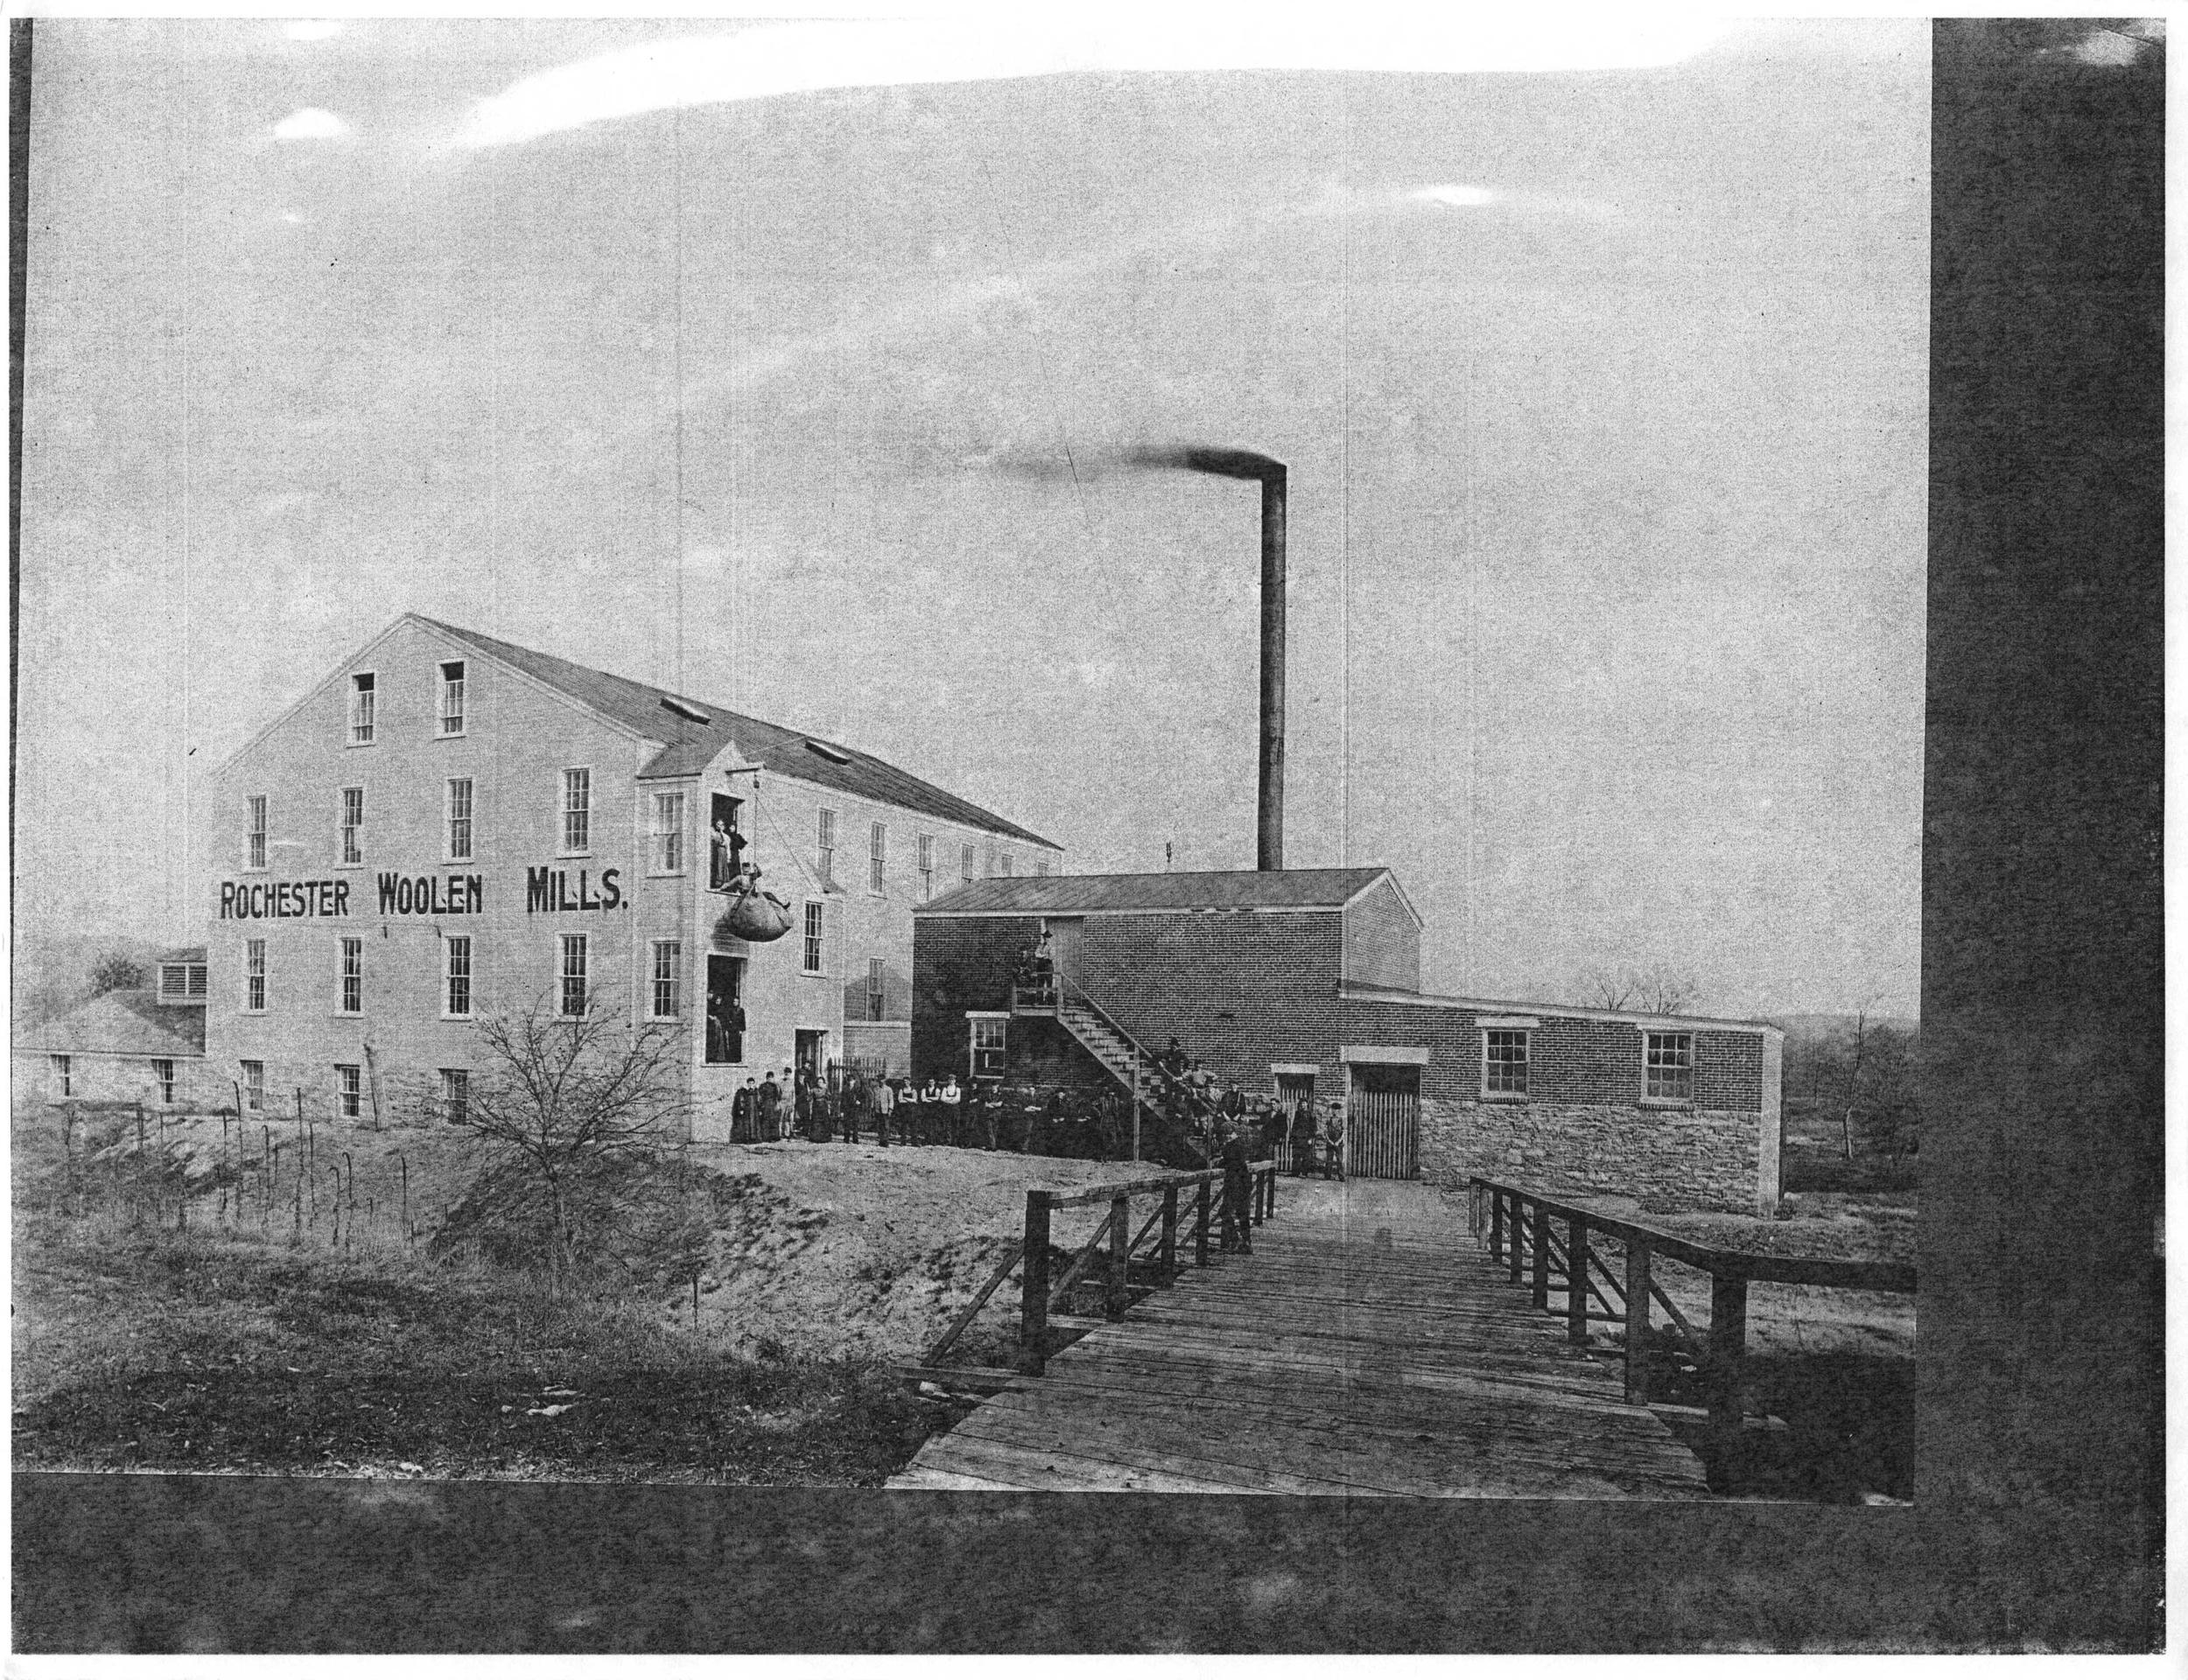 Rochester Woolen Mills pic.jpg